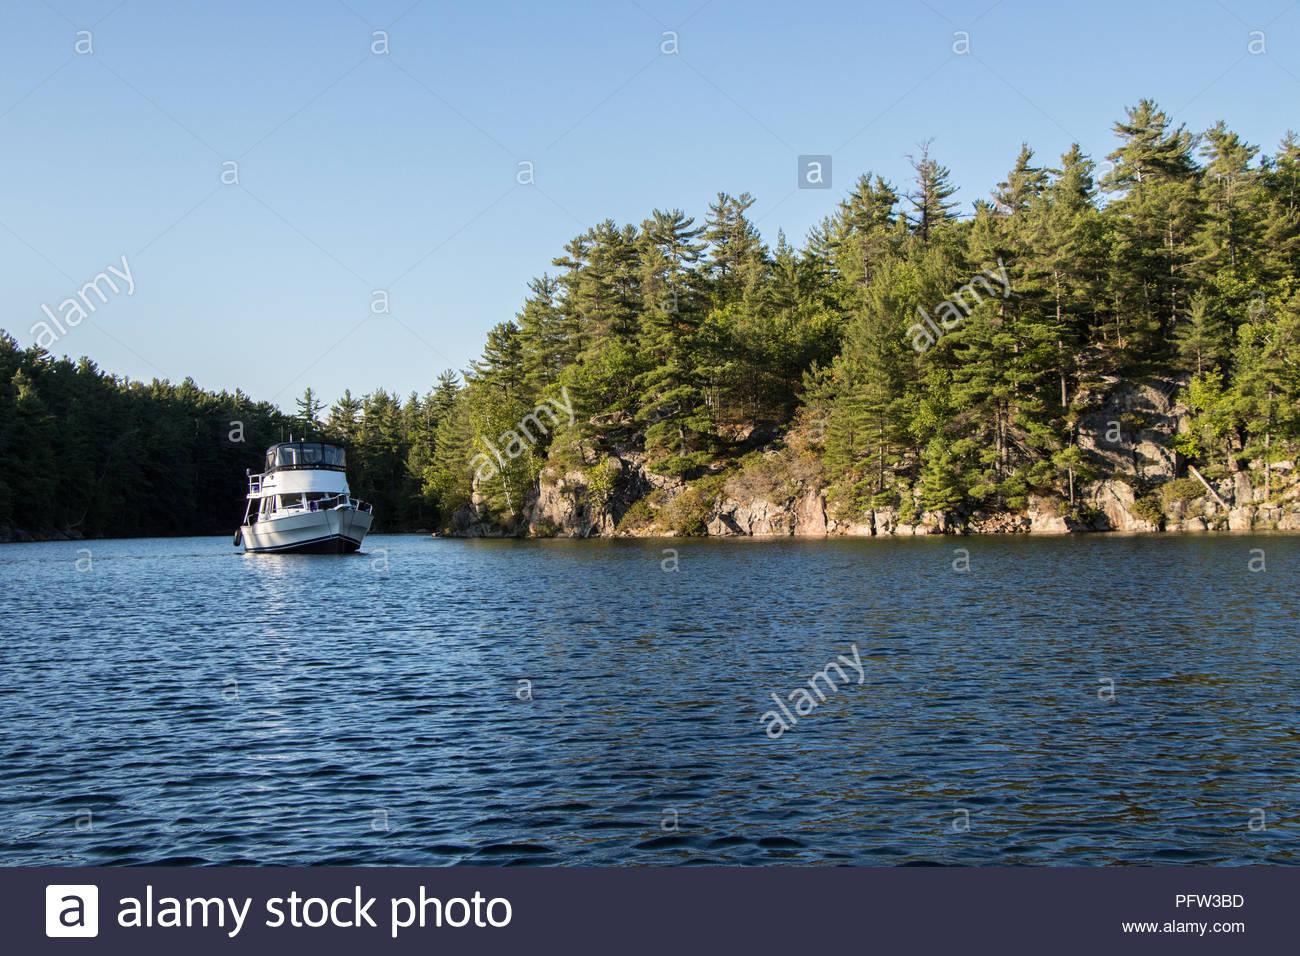 Canadian lakes singles